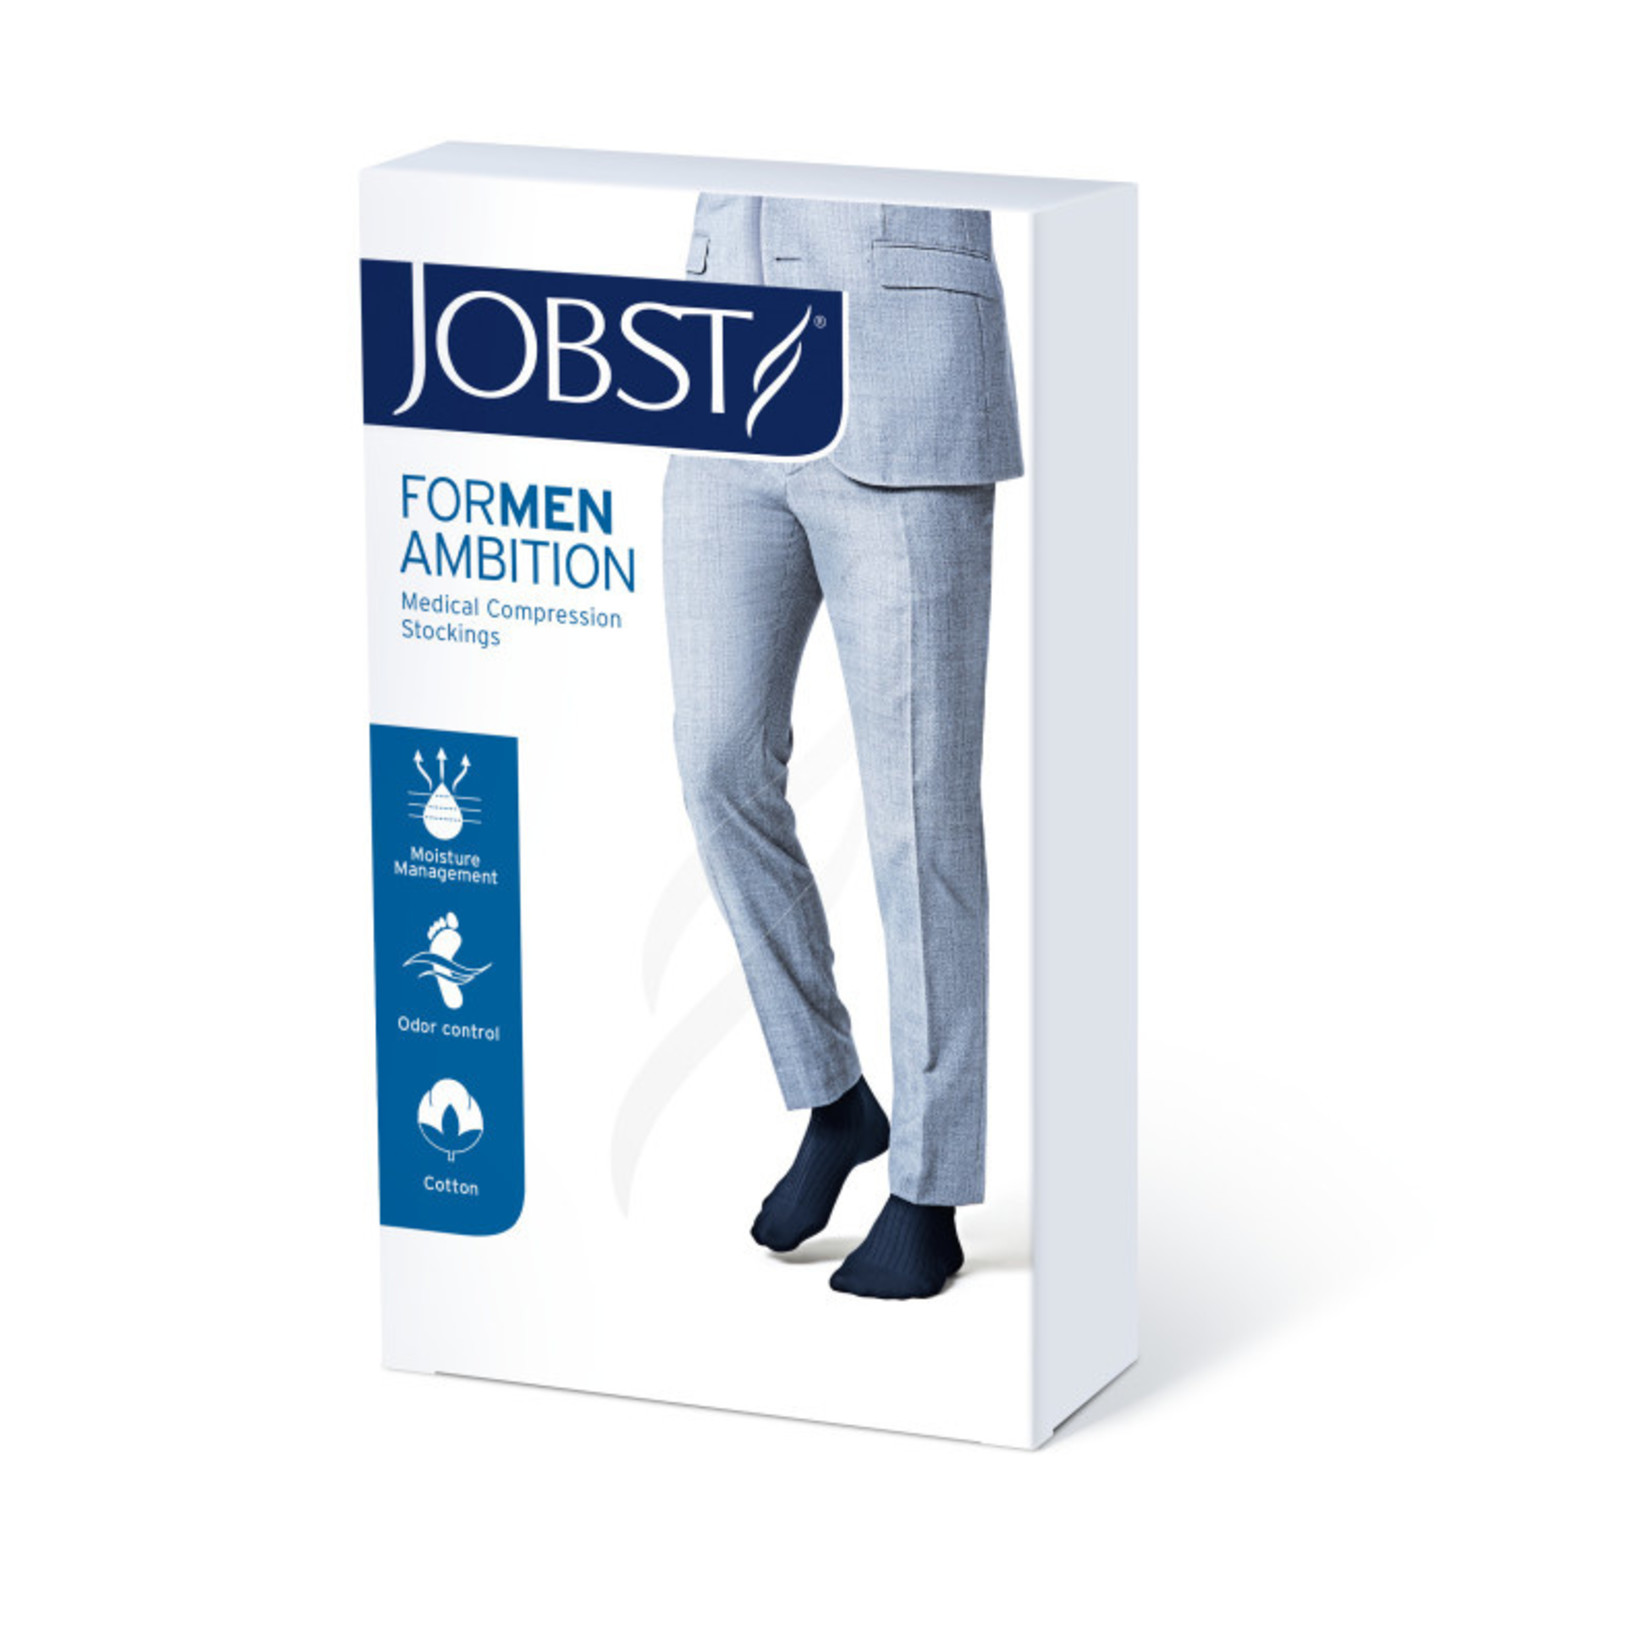 JOBST JOBST FORMEN AMBITION KNEE 15-20 mmHg